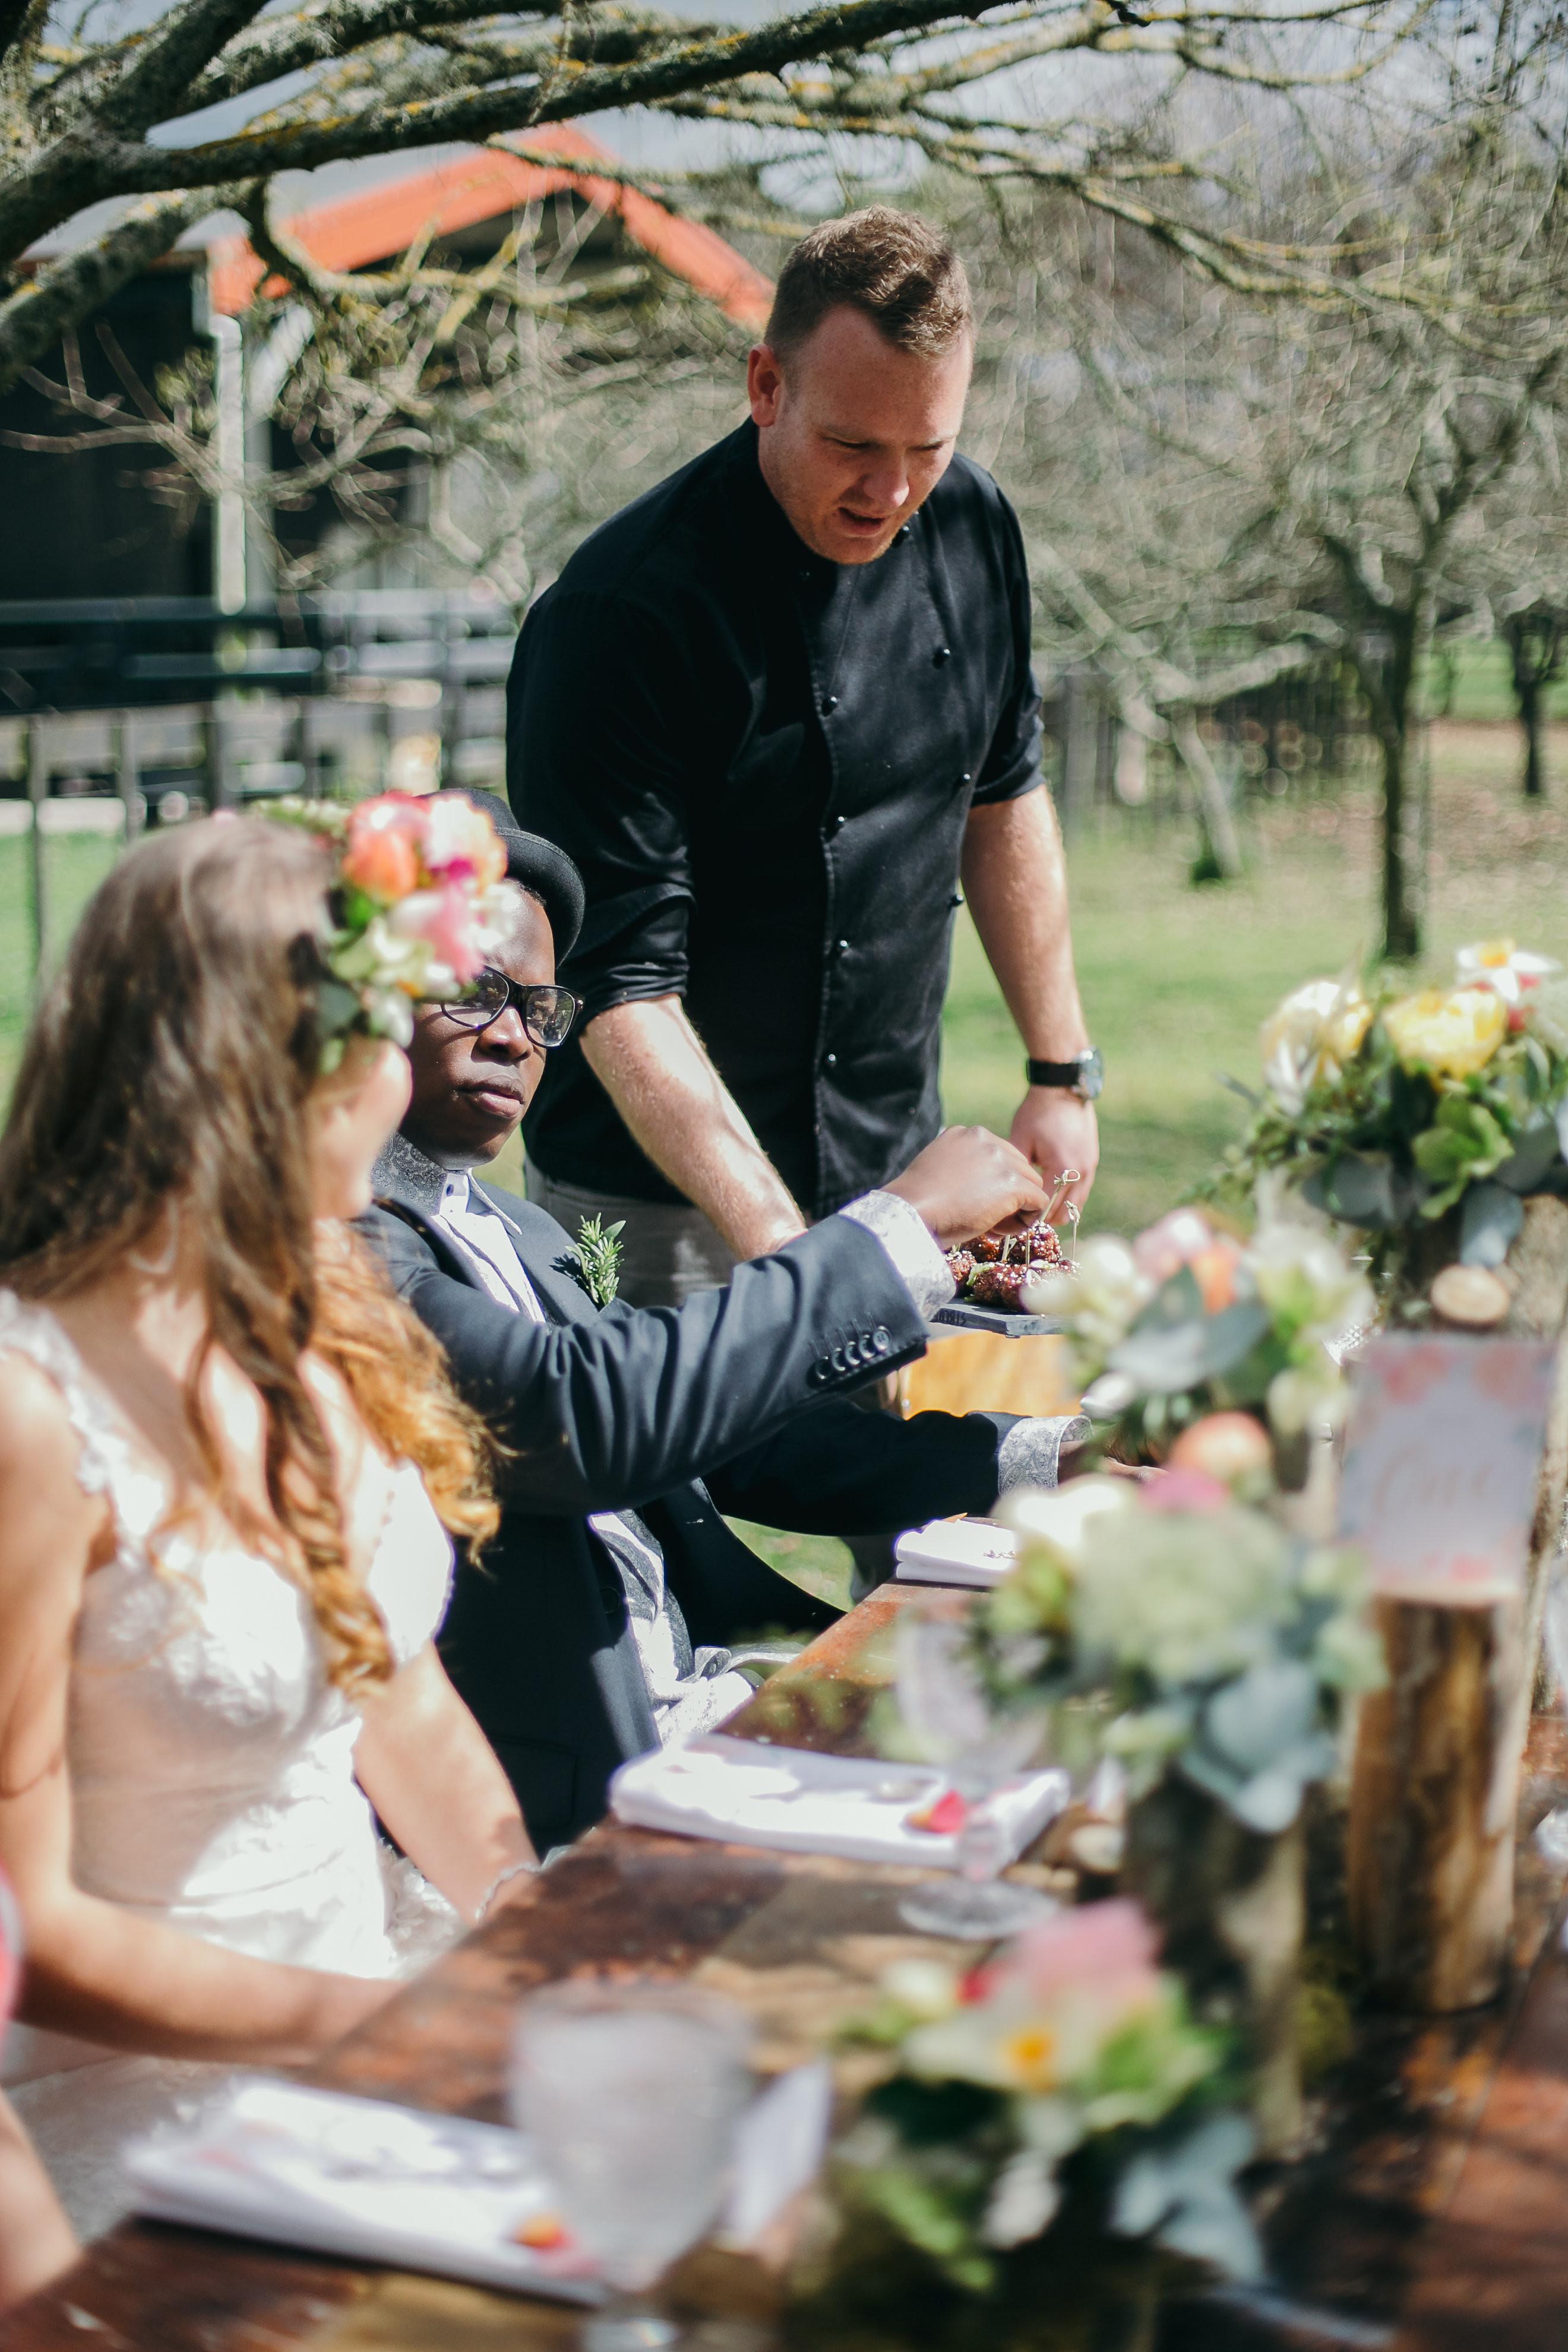 Wedding catering consultation